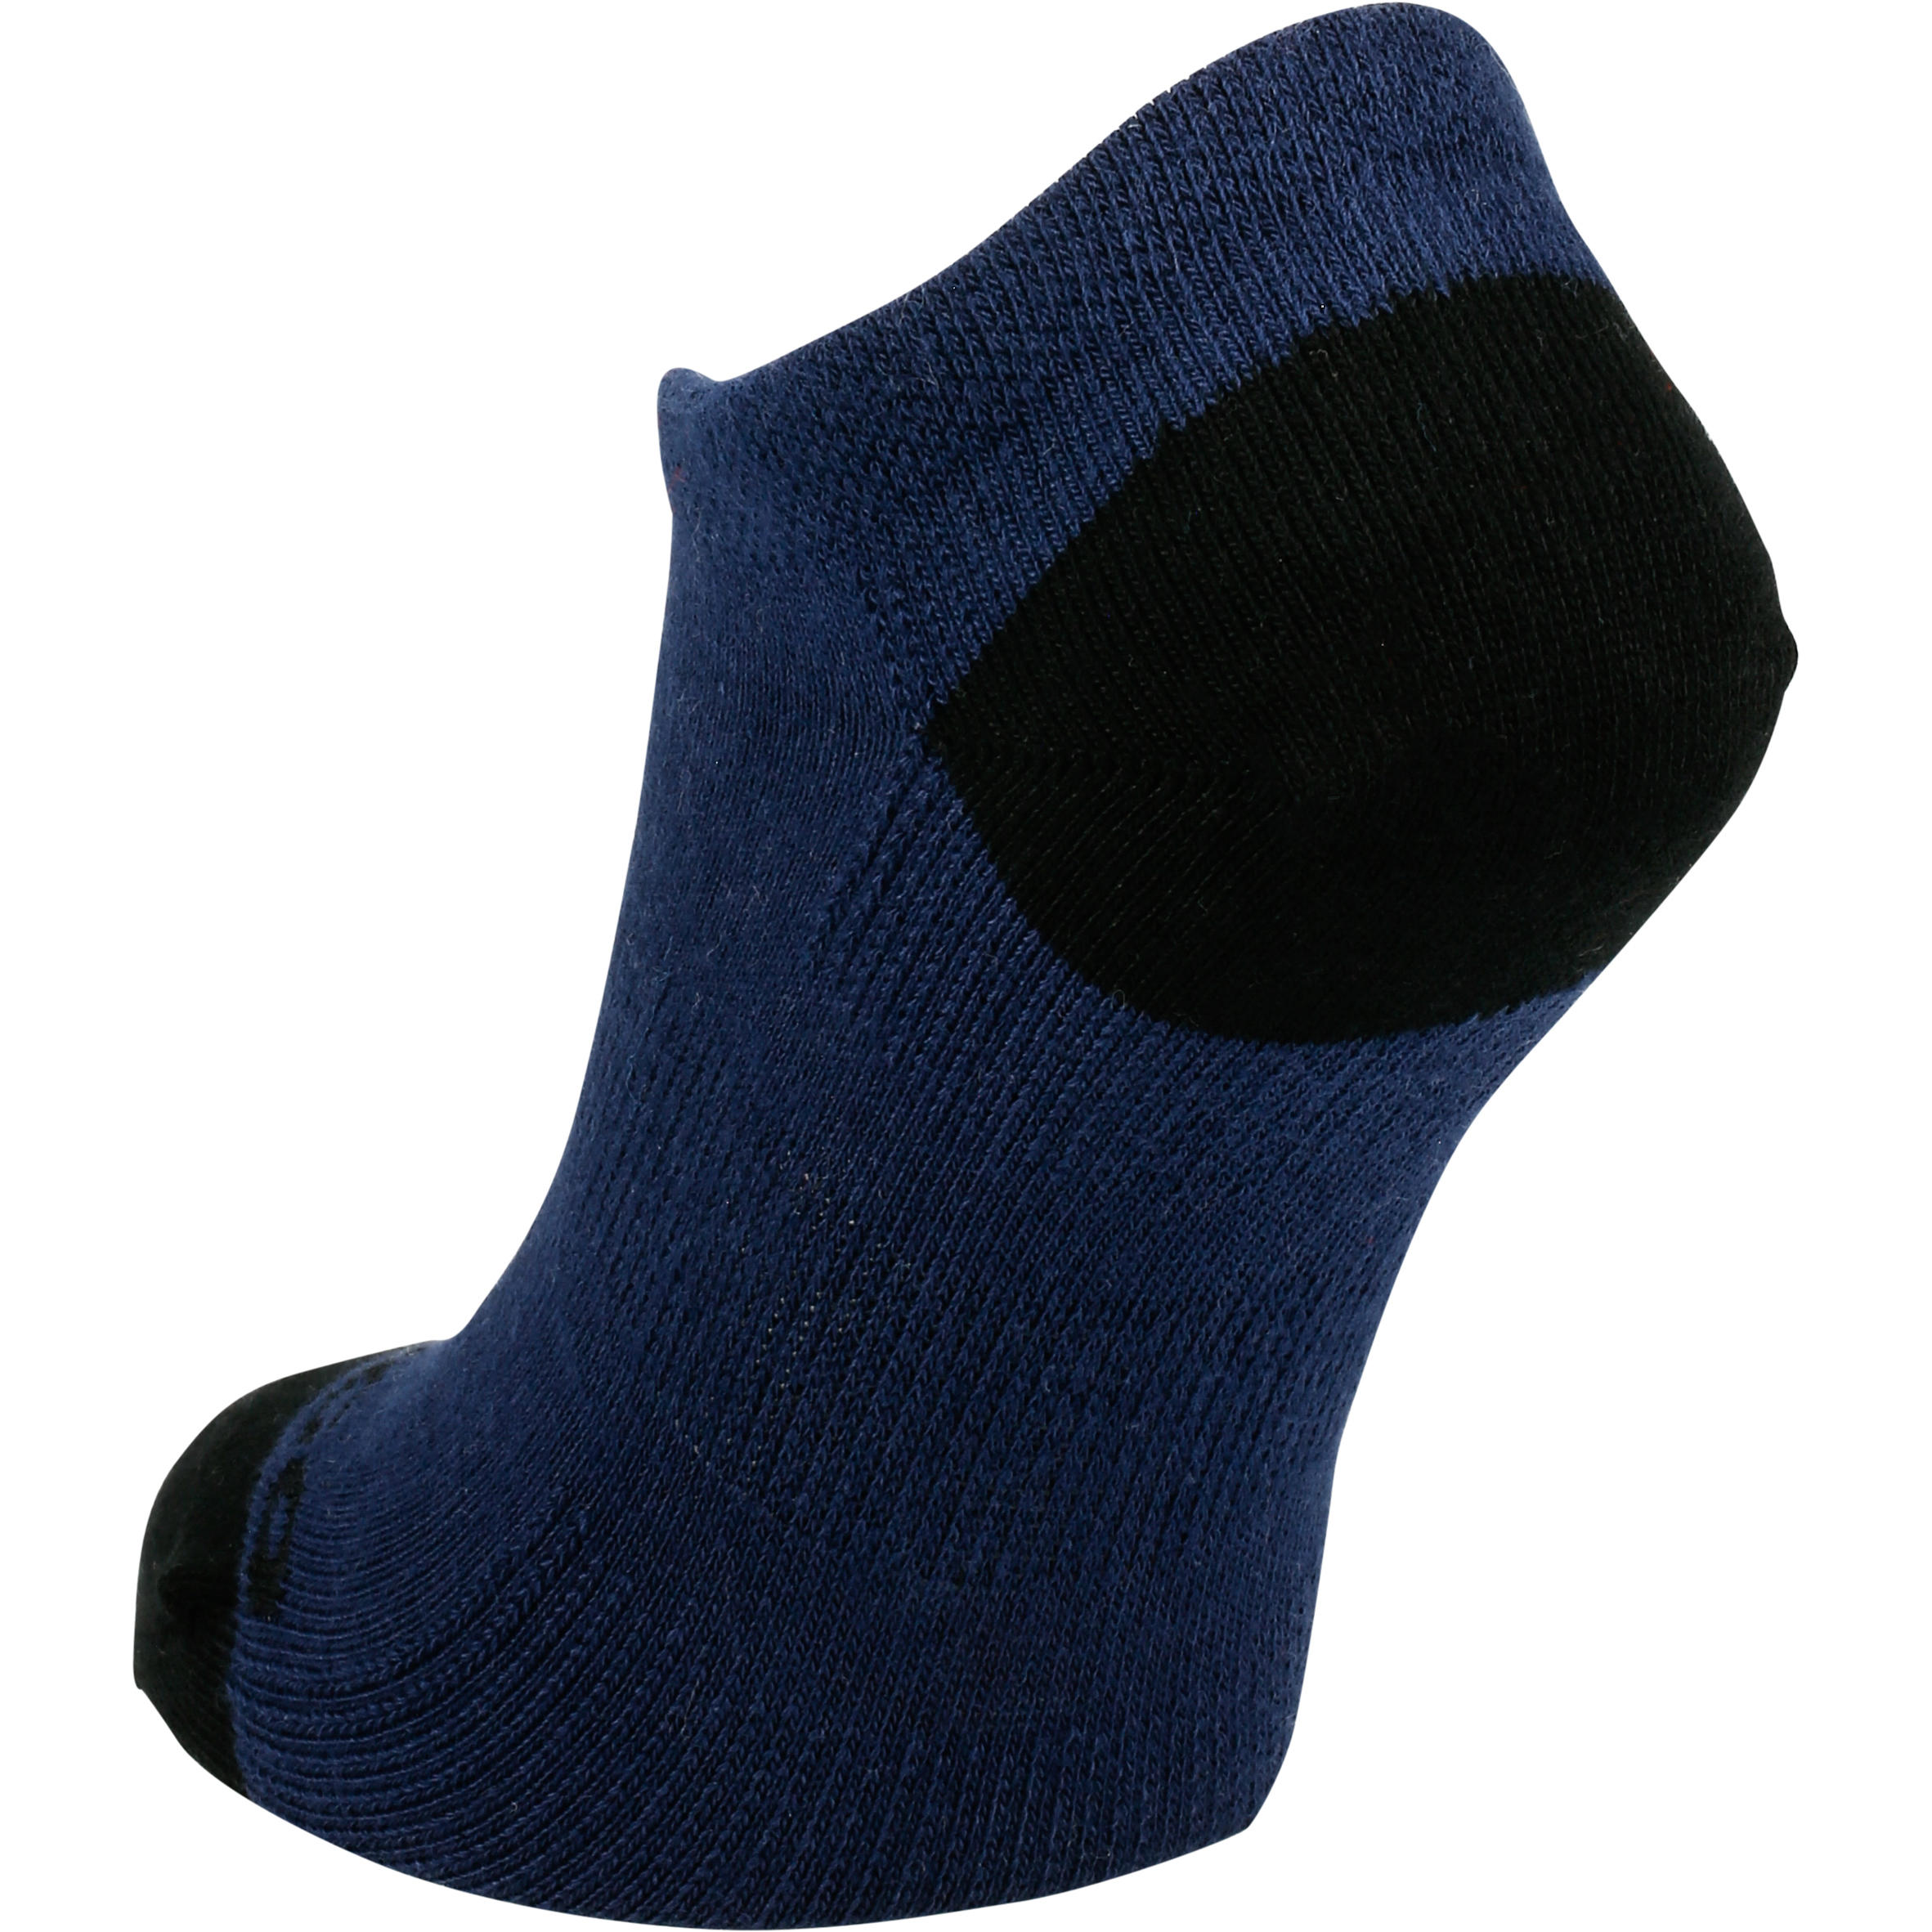 Junior Socks Low 3-Pack - Navy Blue